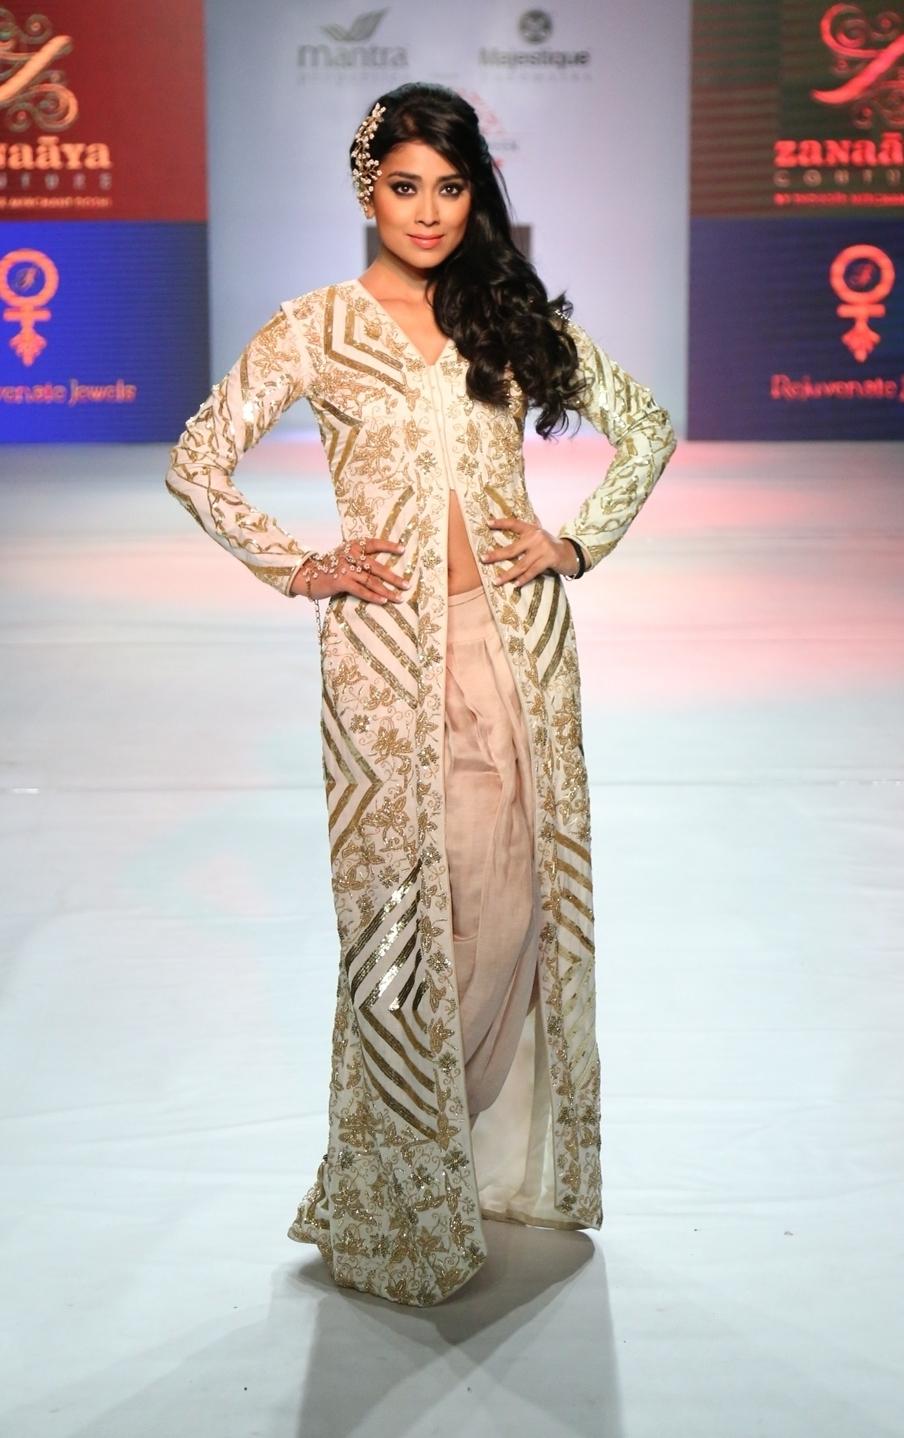 Pune Fashion Week 2014 - Shriya Saran for Shouger Merchant Doshi